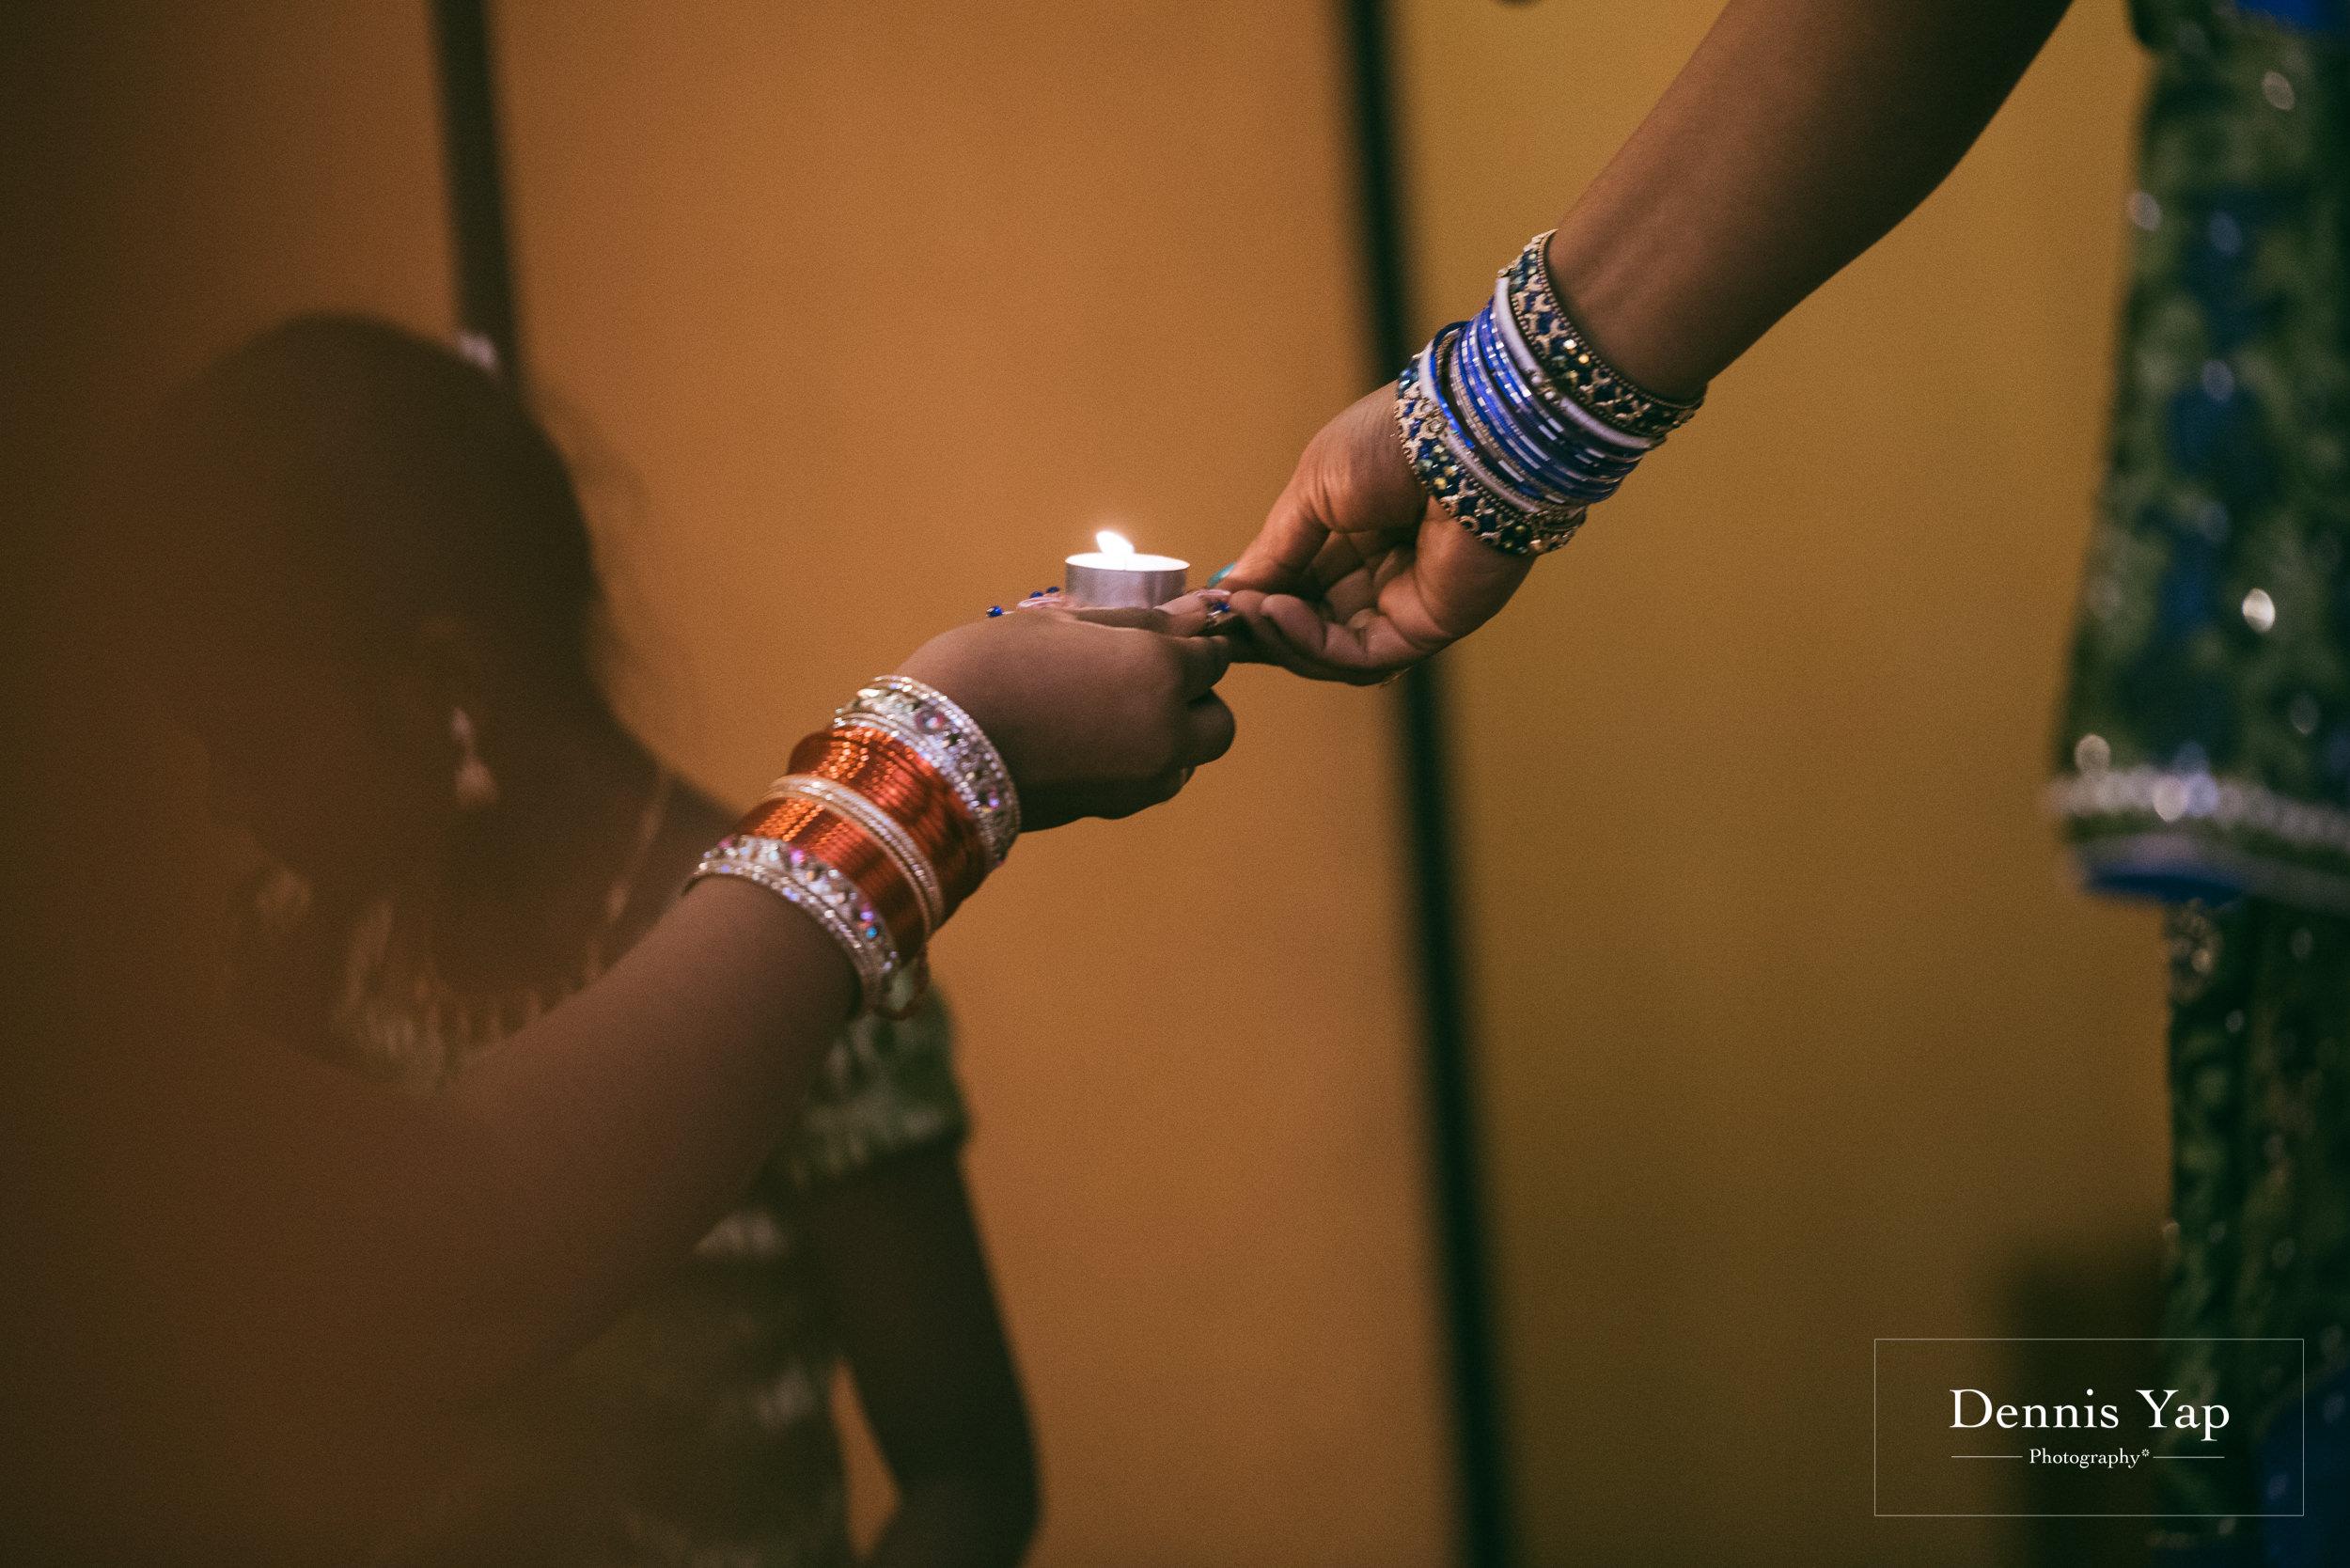 puvaneswaran cangitaa indian wedding ceremony ideal convention dennis yap photography malaysia-9.jpg